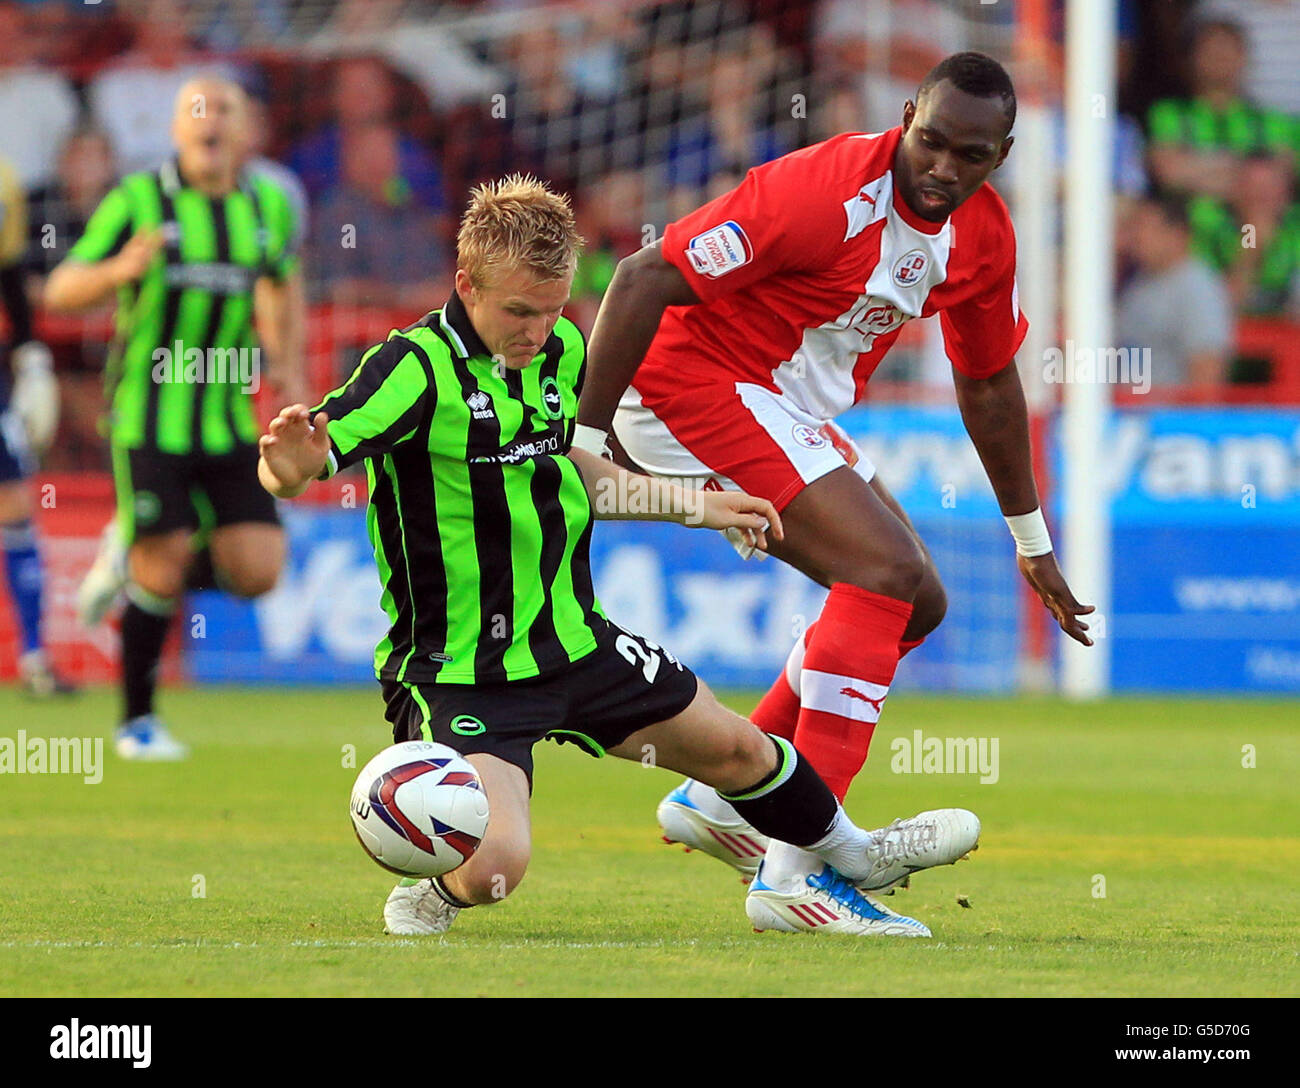 Soccer - Pre Season Friendly - Crawley Town v Brighton & Hove Albion - Broadfield Stadium - Stock Image